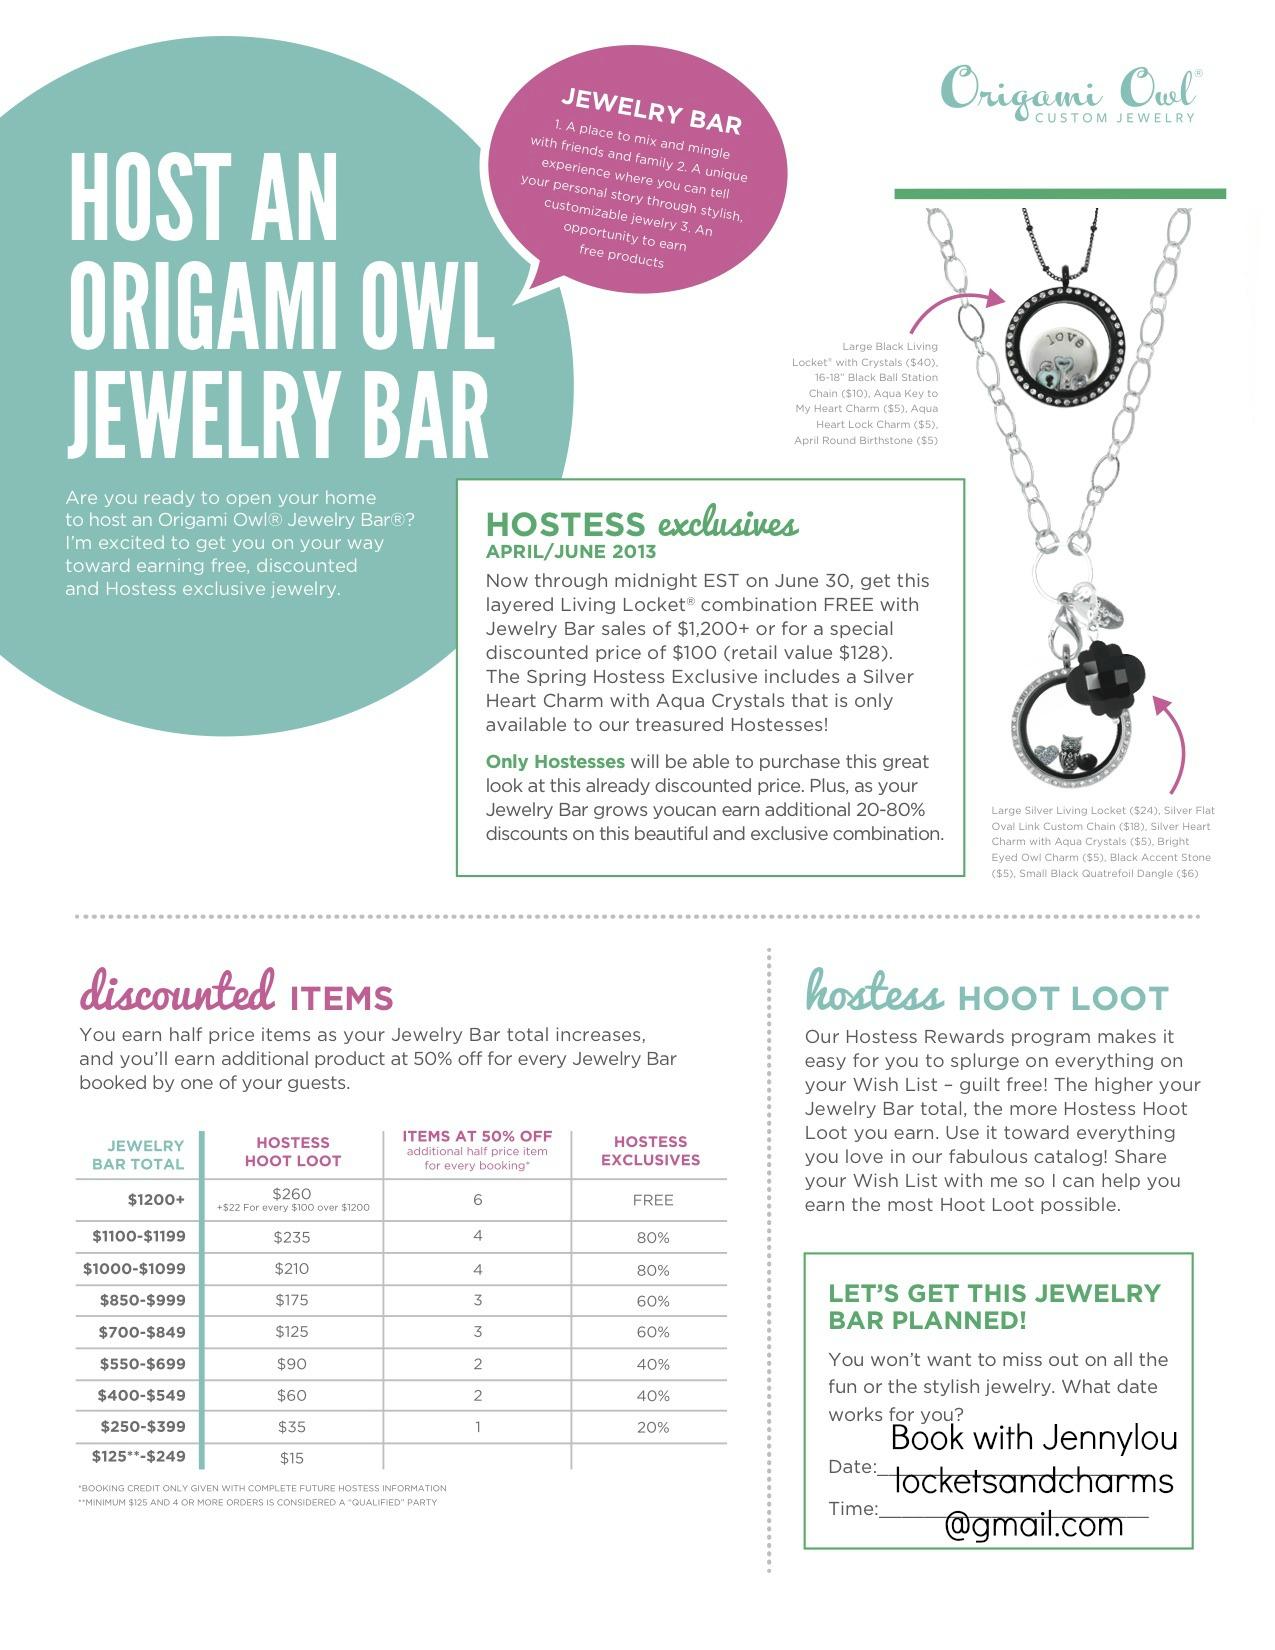 Jennifer Koether, Origami Owl Designer #202231996 - Startseite ... | 1650x1275